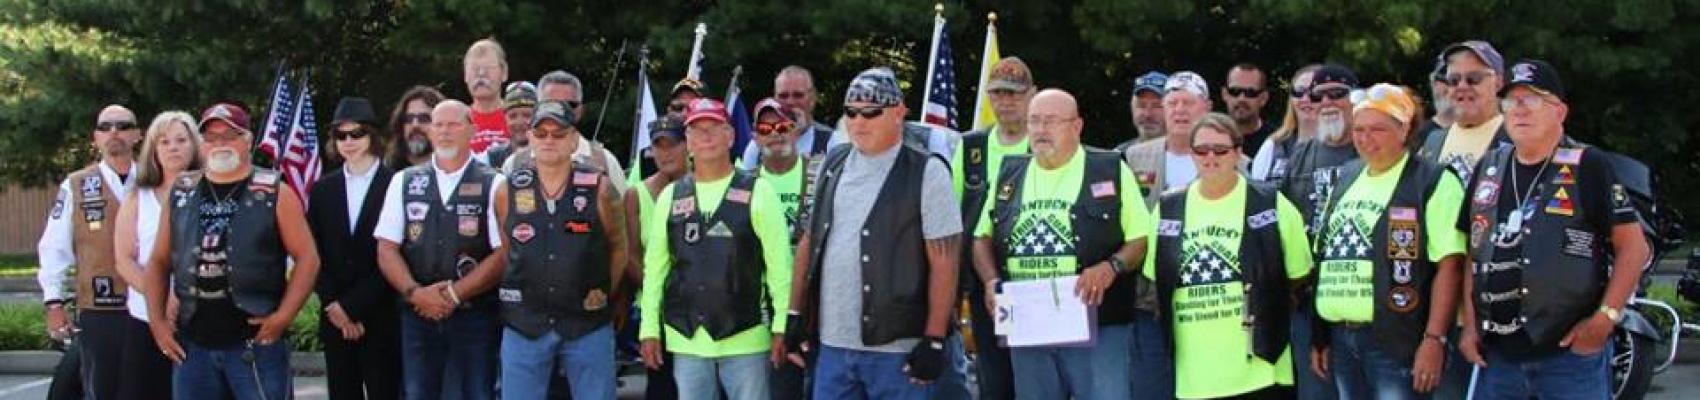 Kentucky Patriot Guard Riders